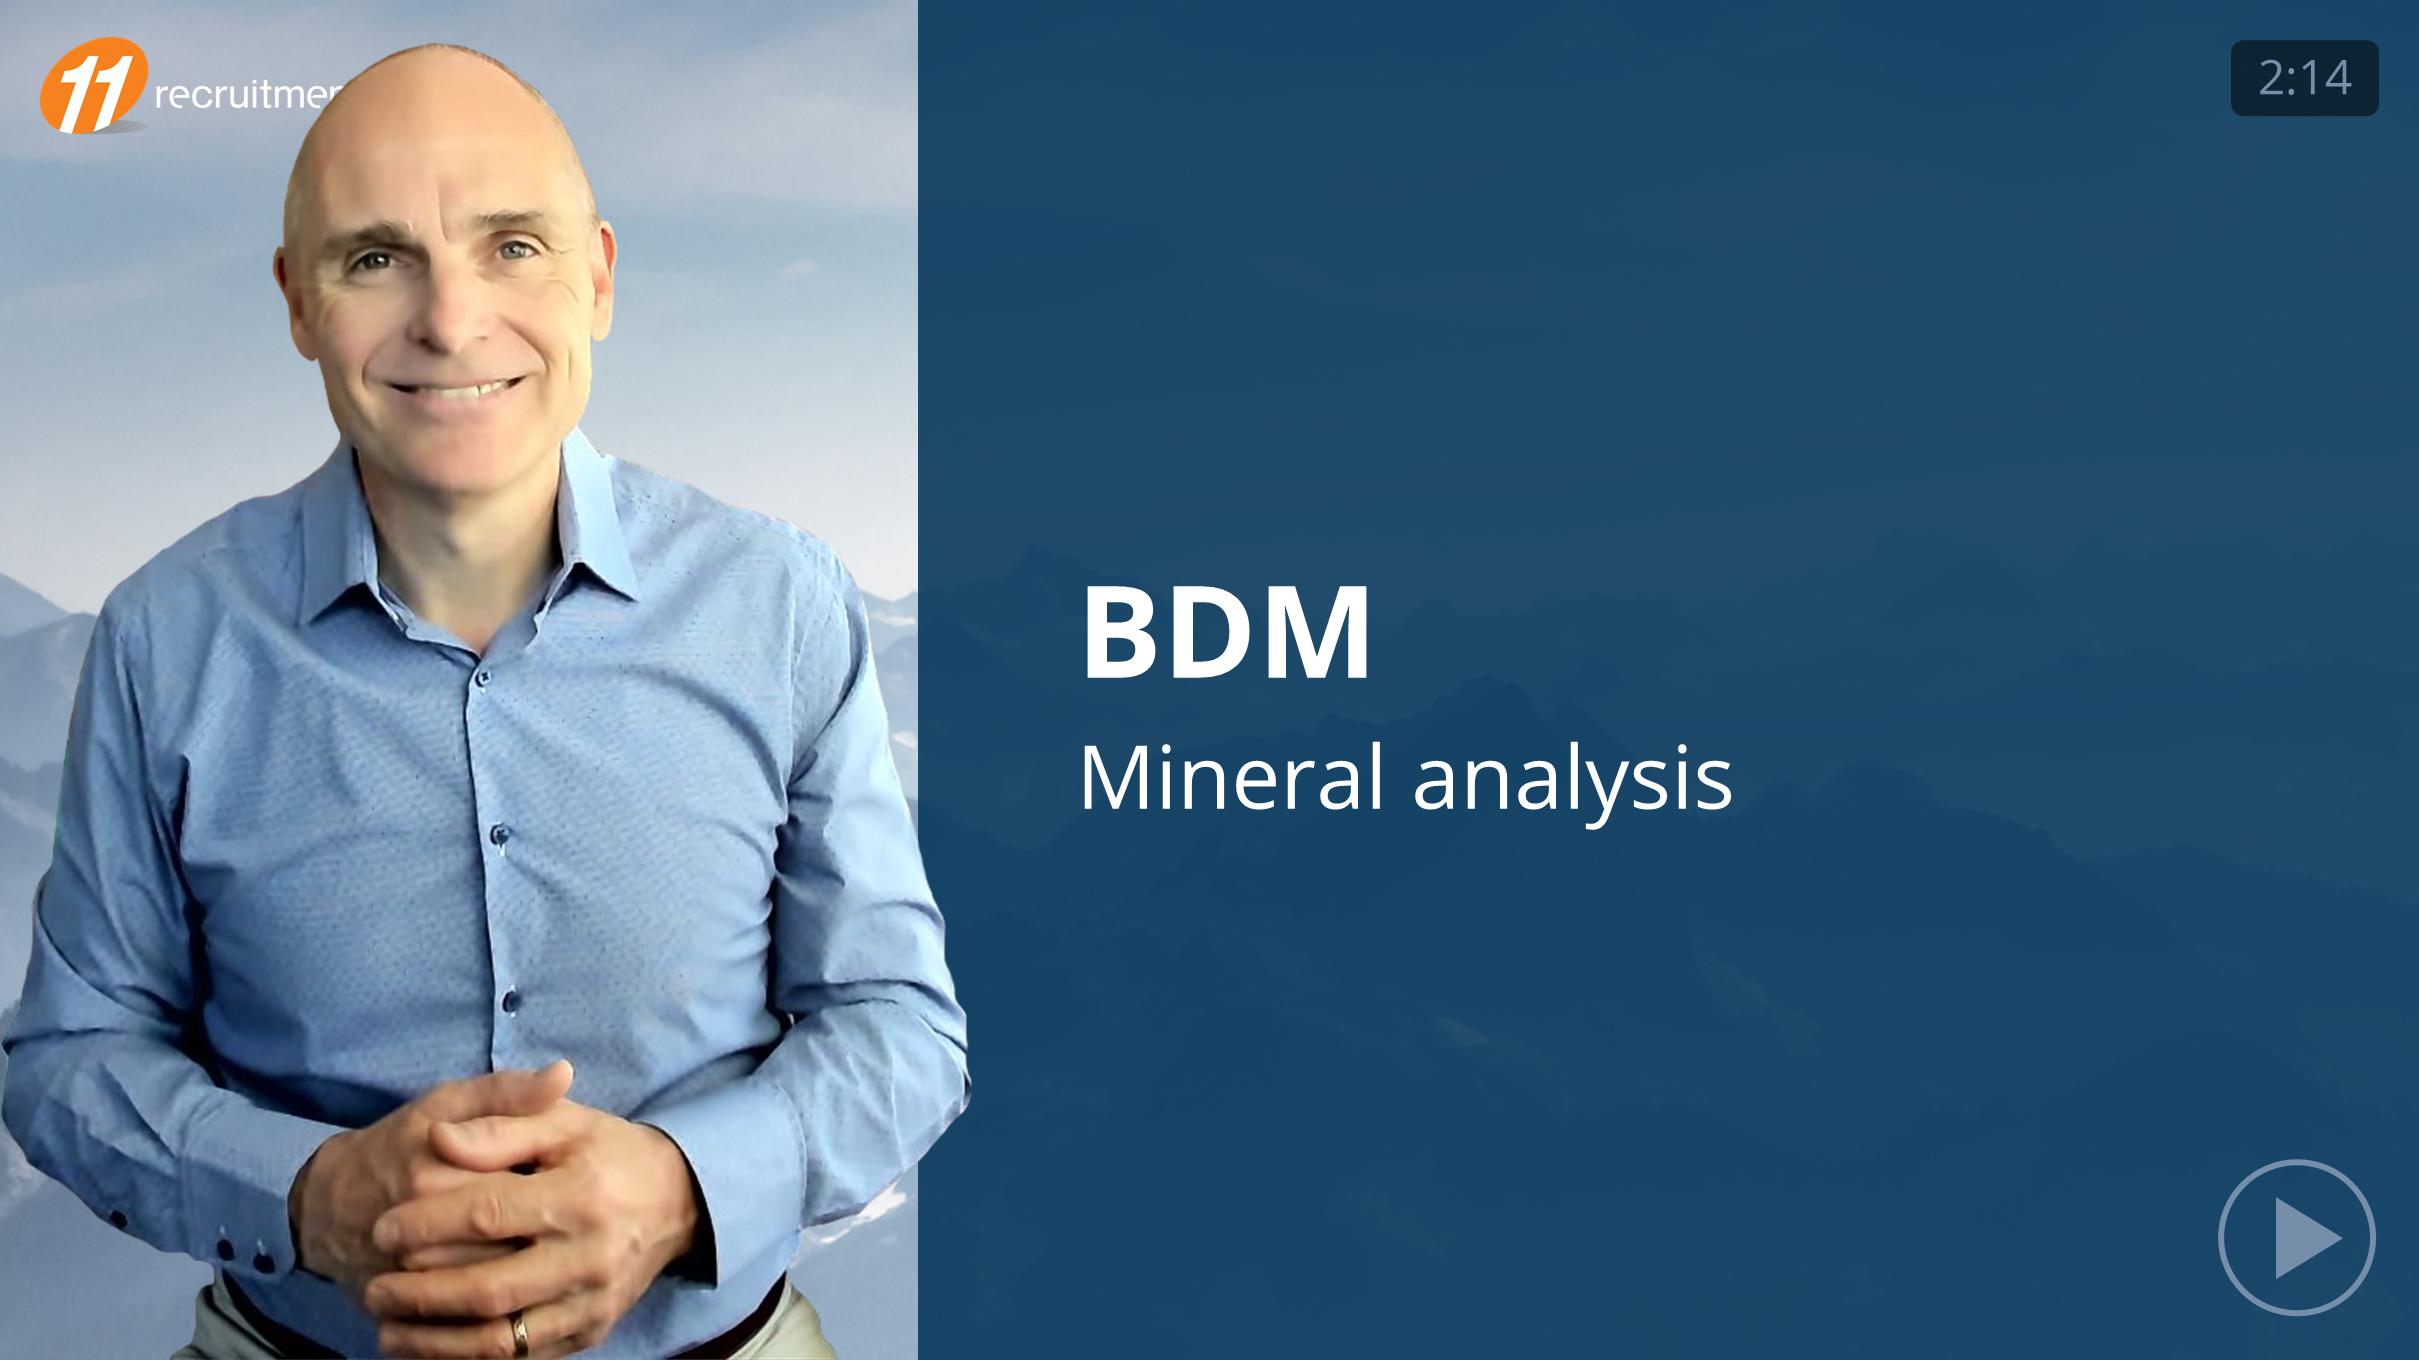 BDM - Minerals